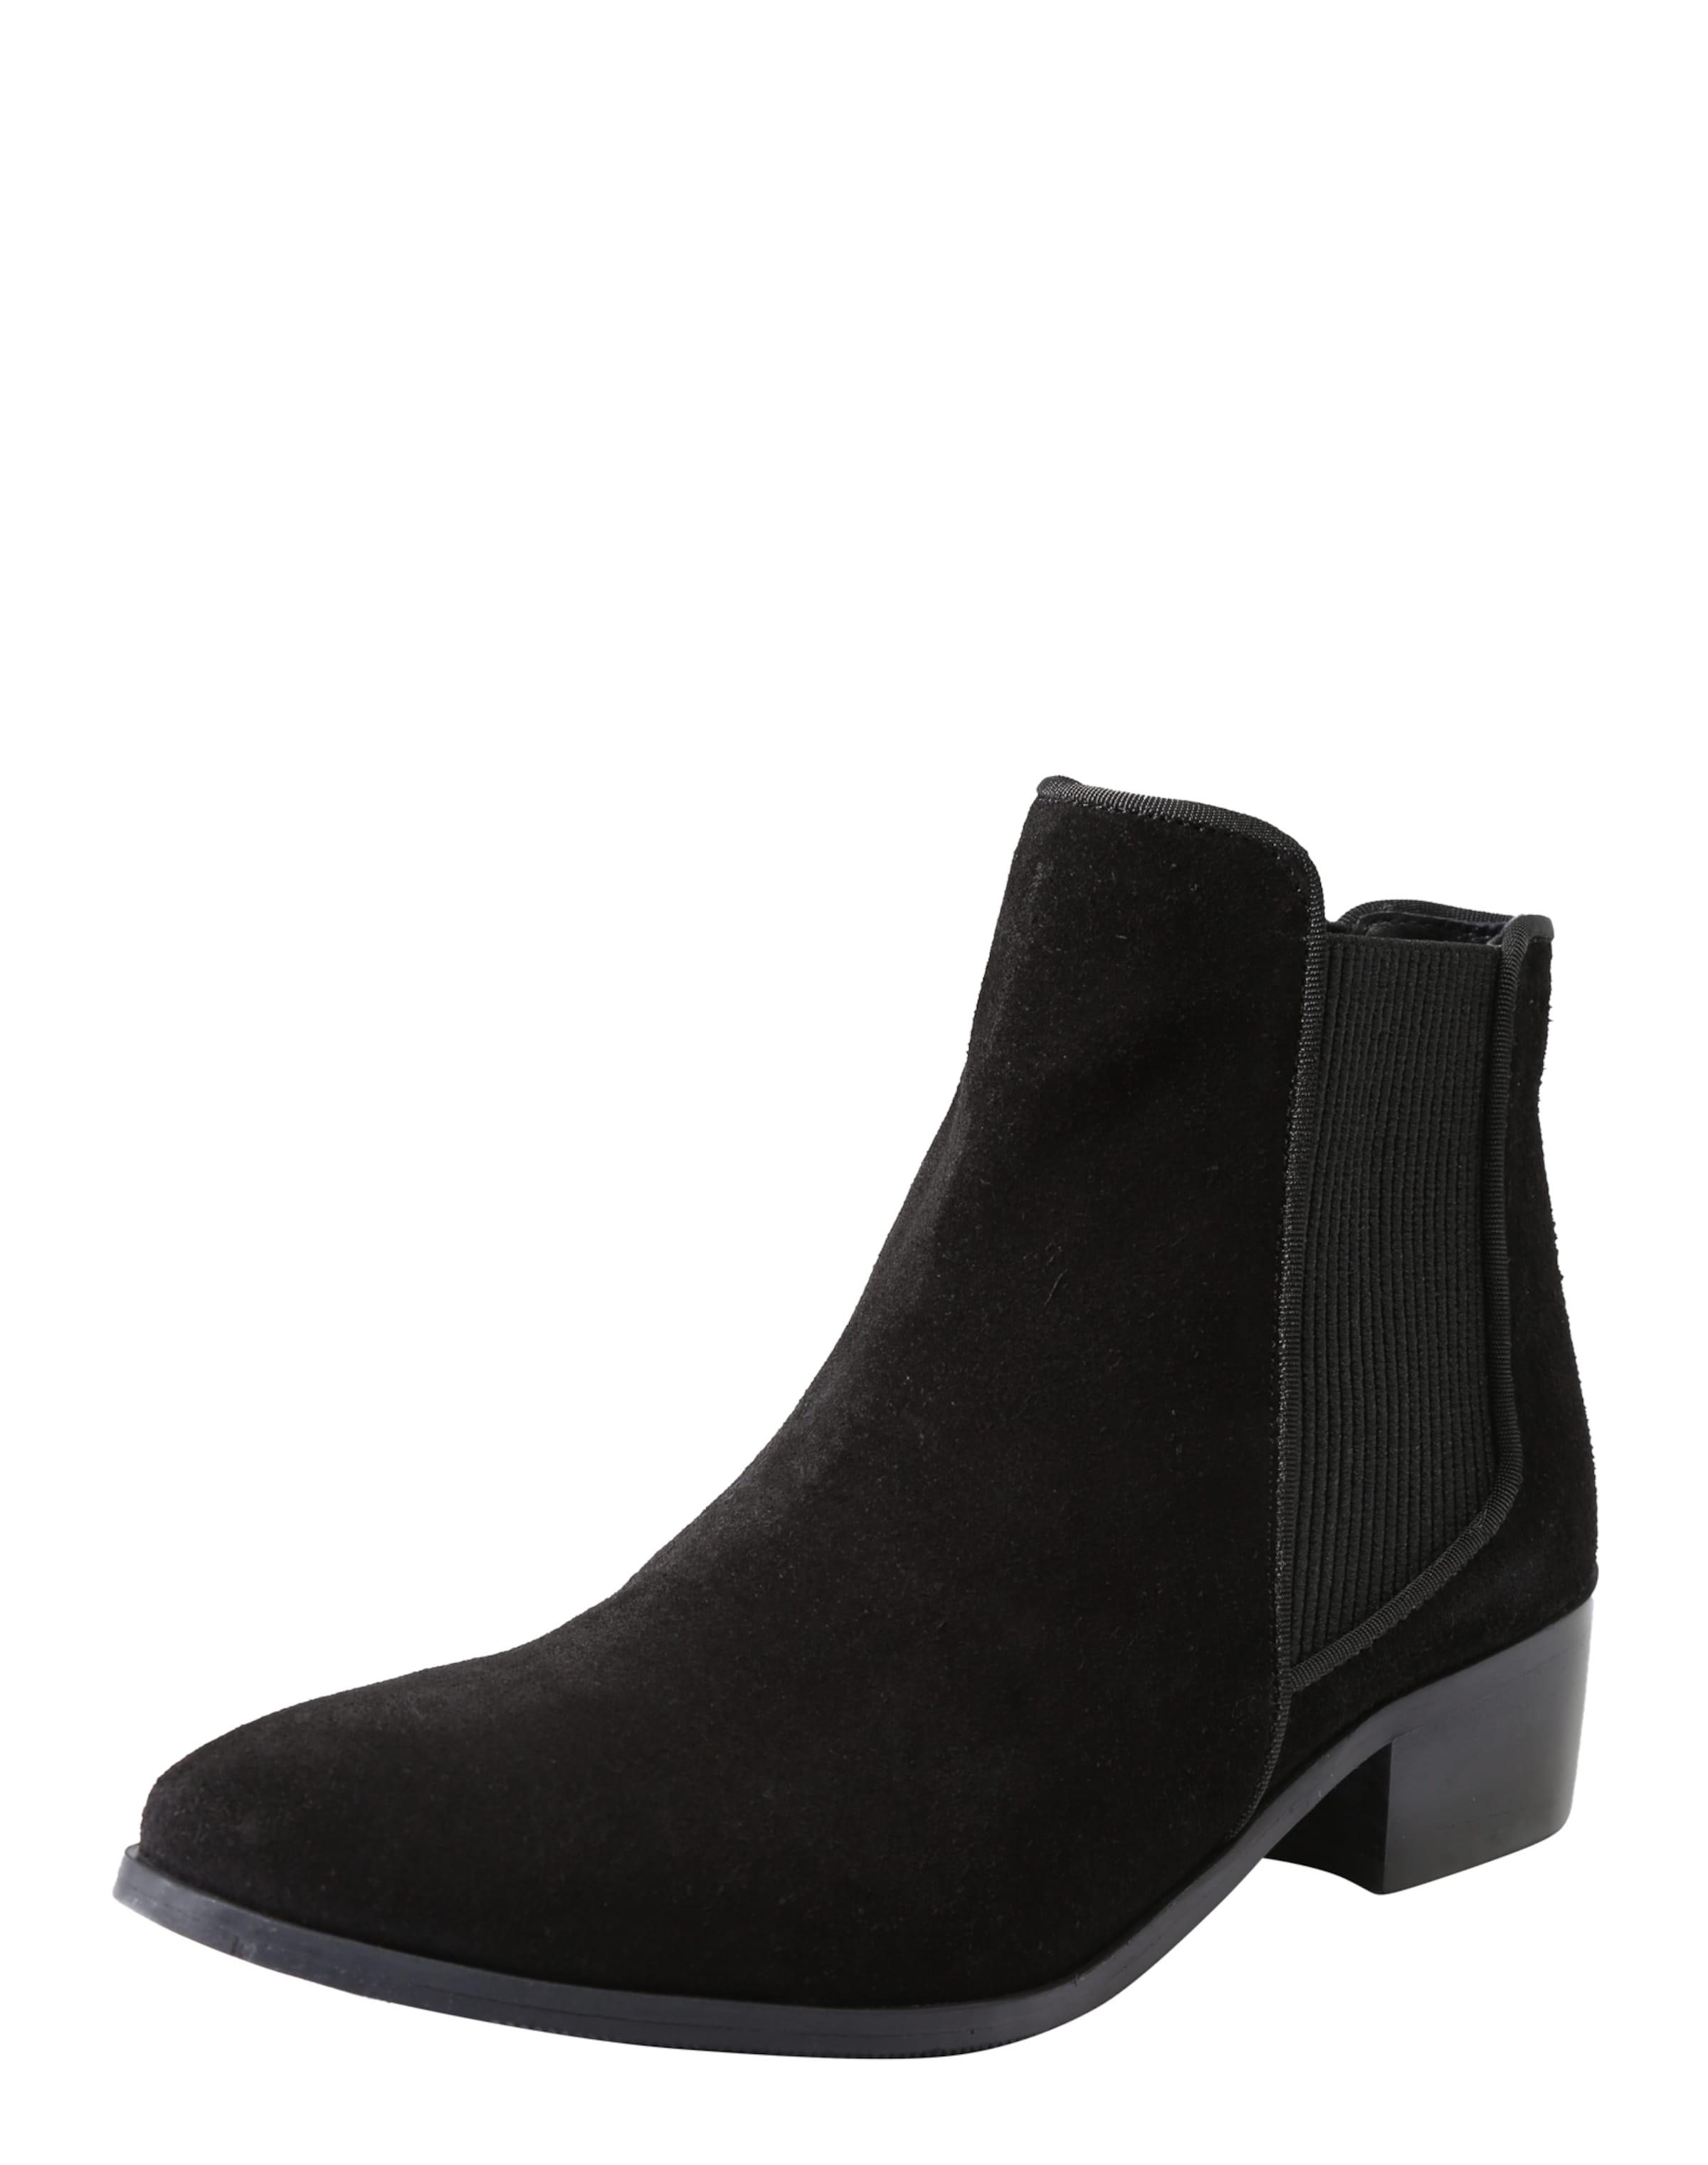 ESPRIT Ankle Boots  Yue